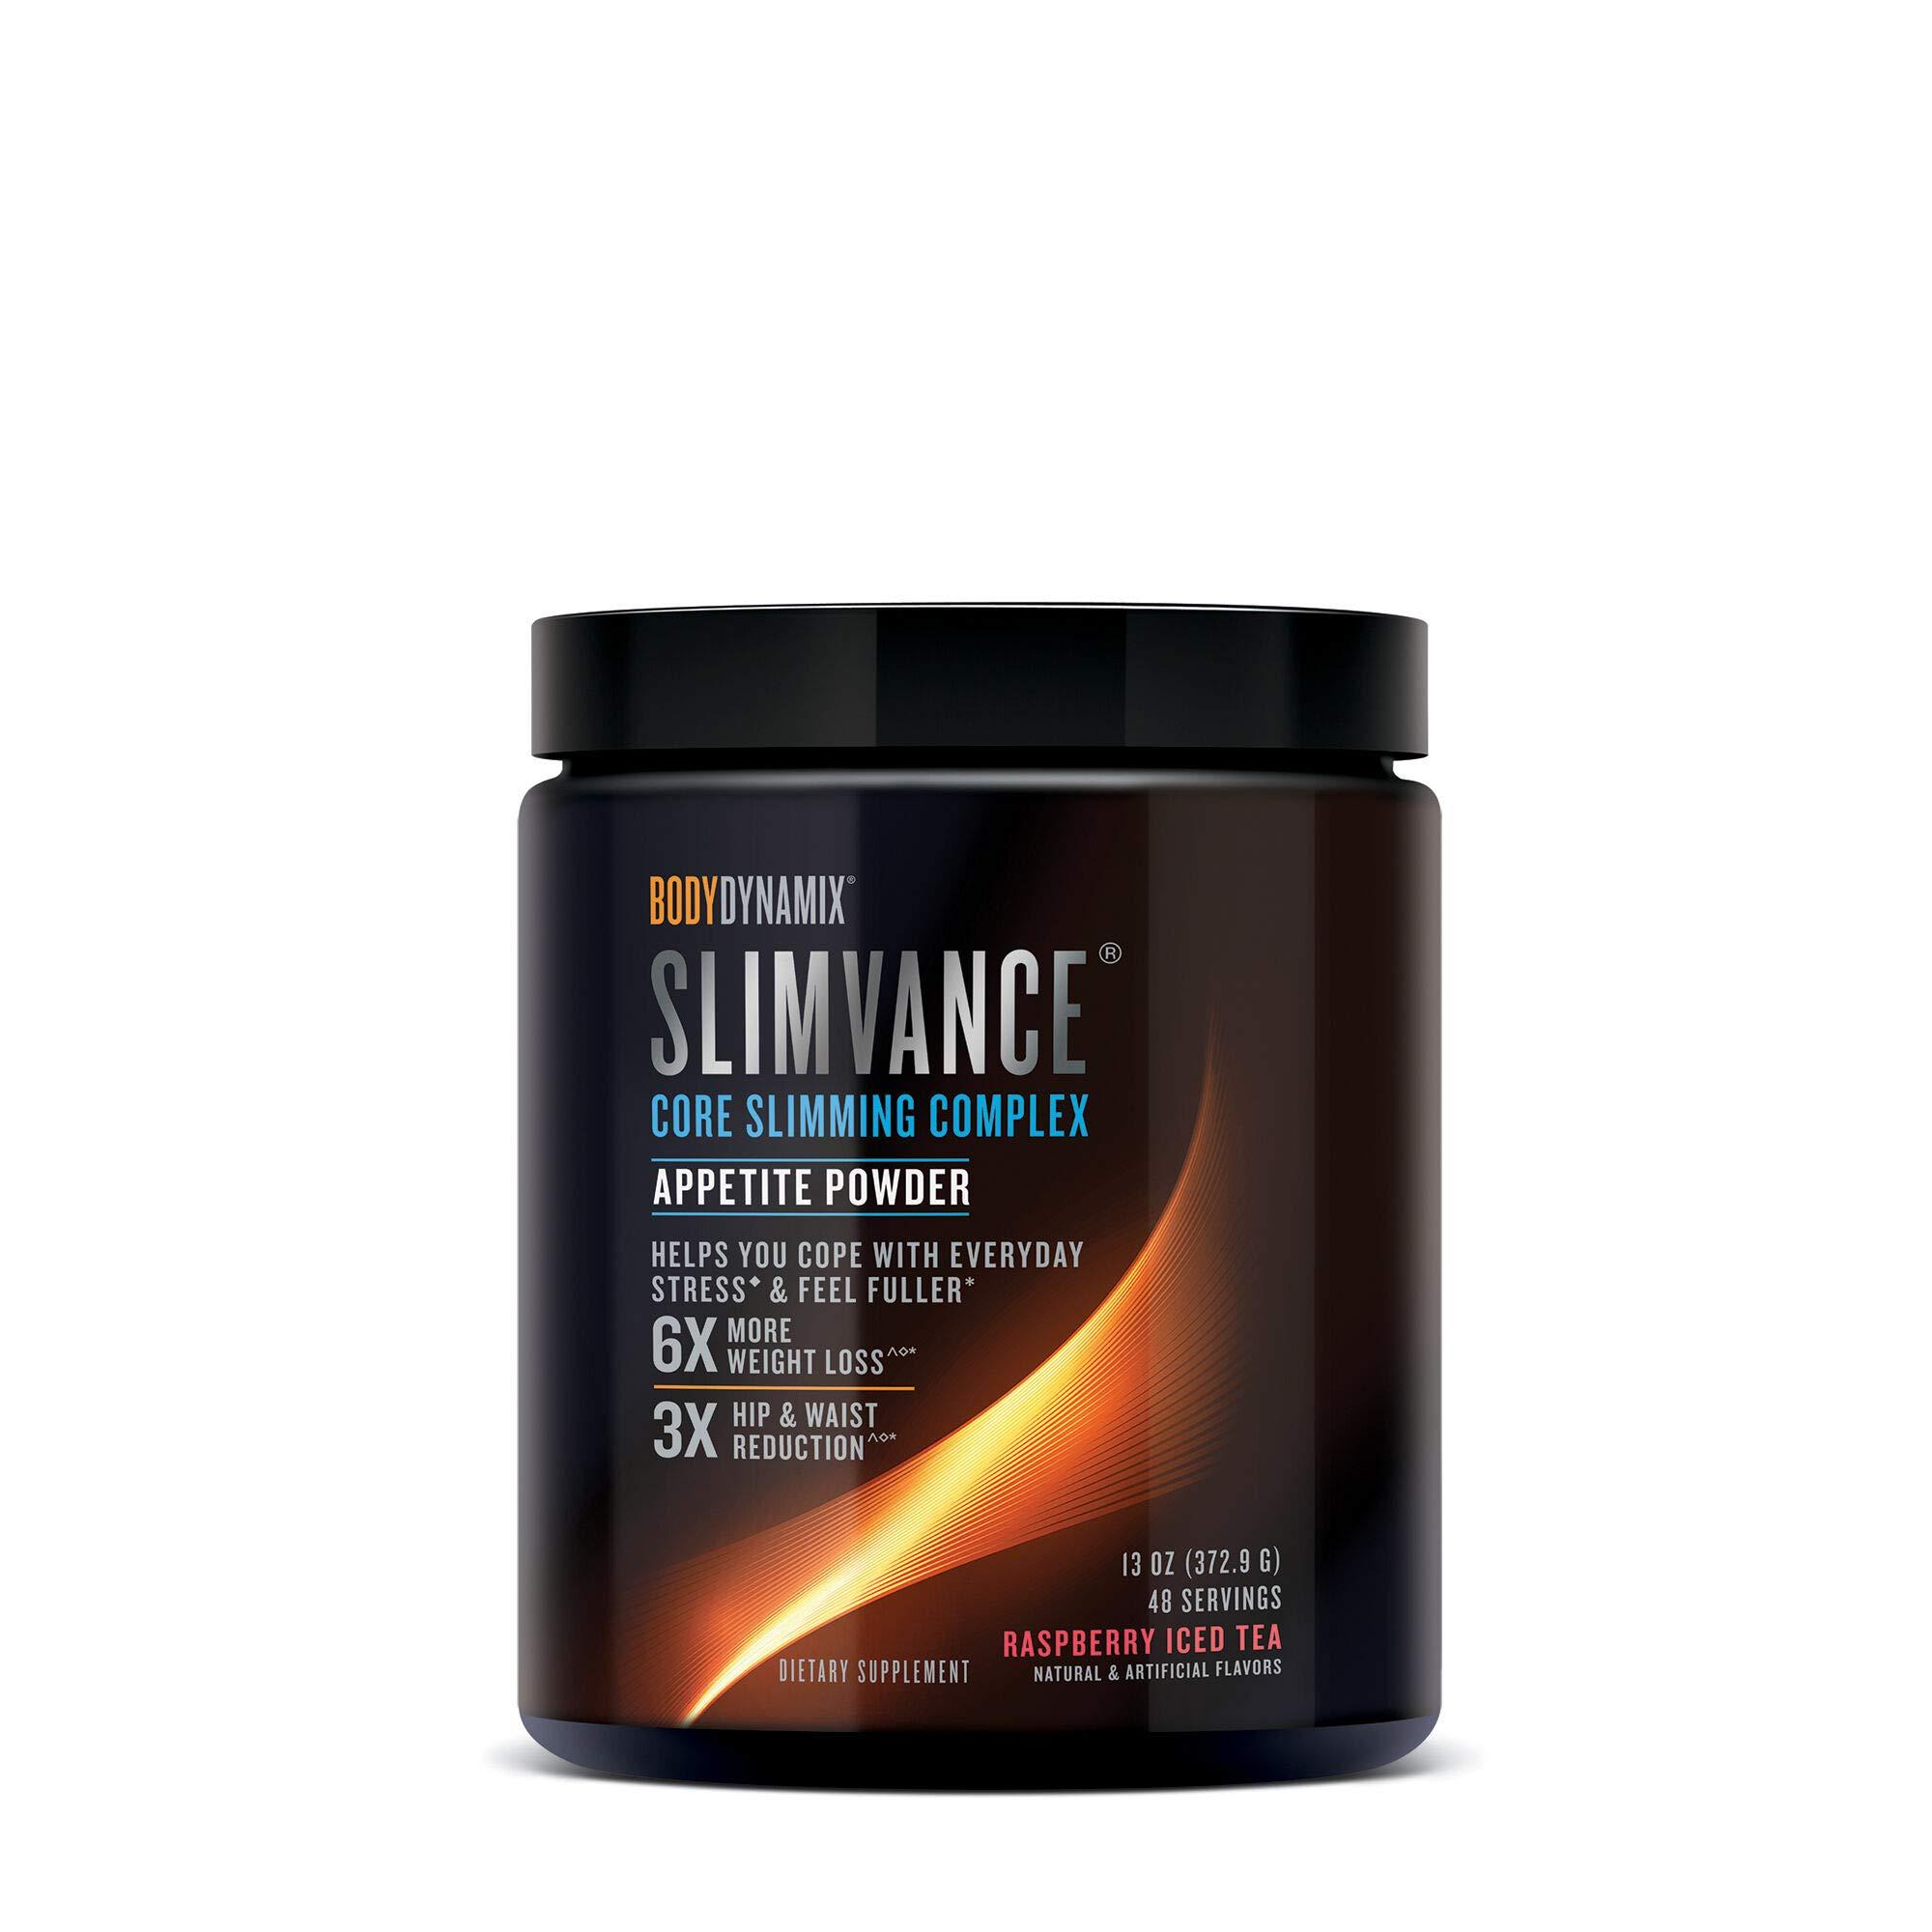 BodyDynamix Slimvance Core Slimming Complex Appetite Powder - Raspberry Iced Tea, 48 Servings, Help Feel Fuller Longer